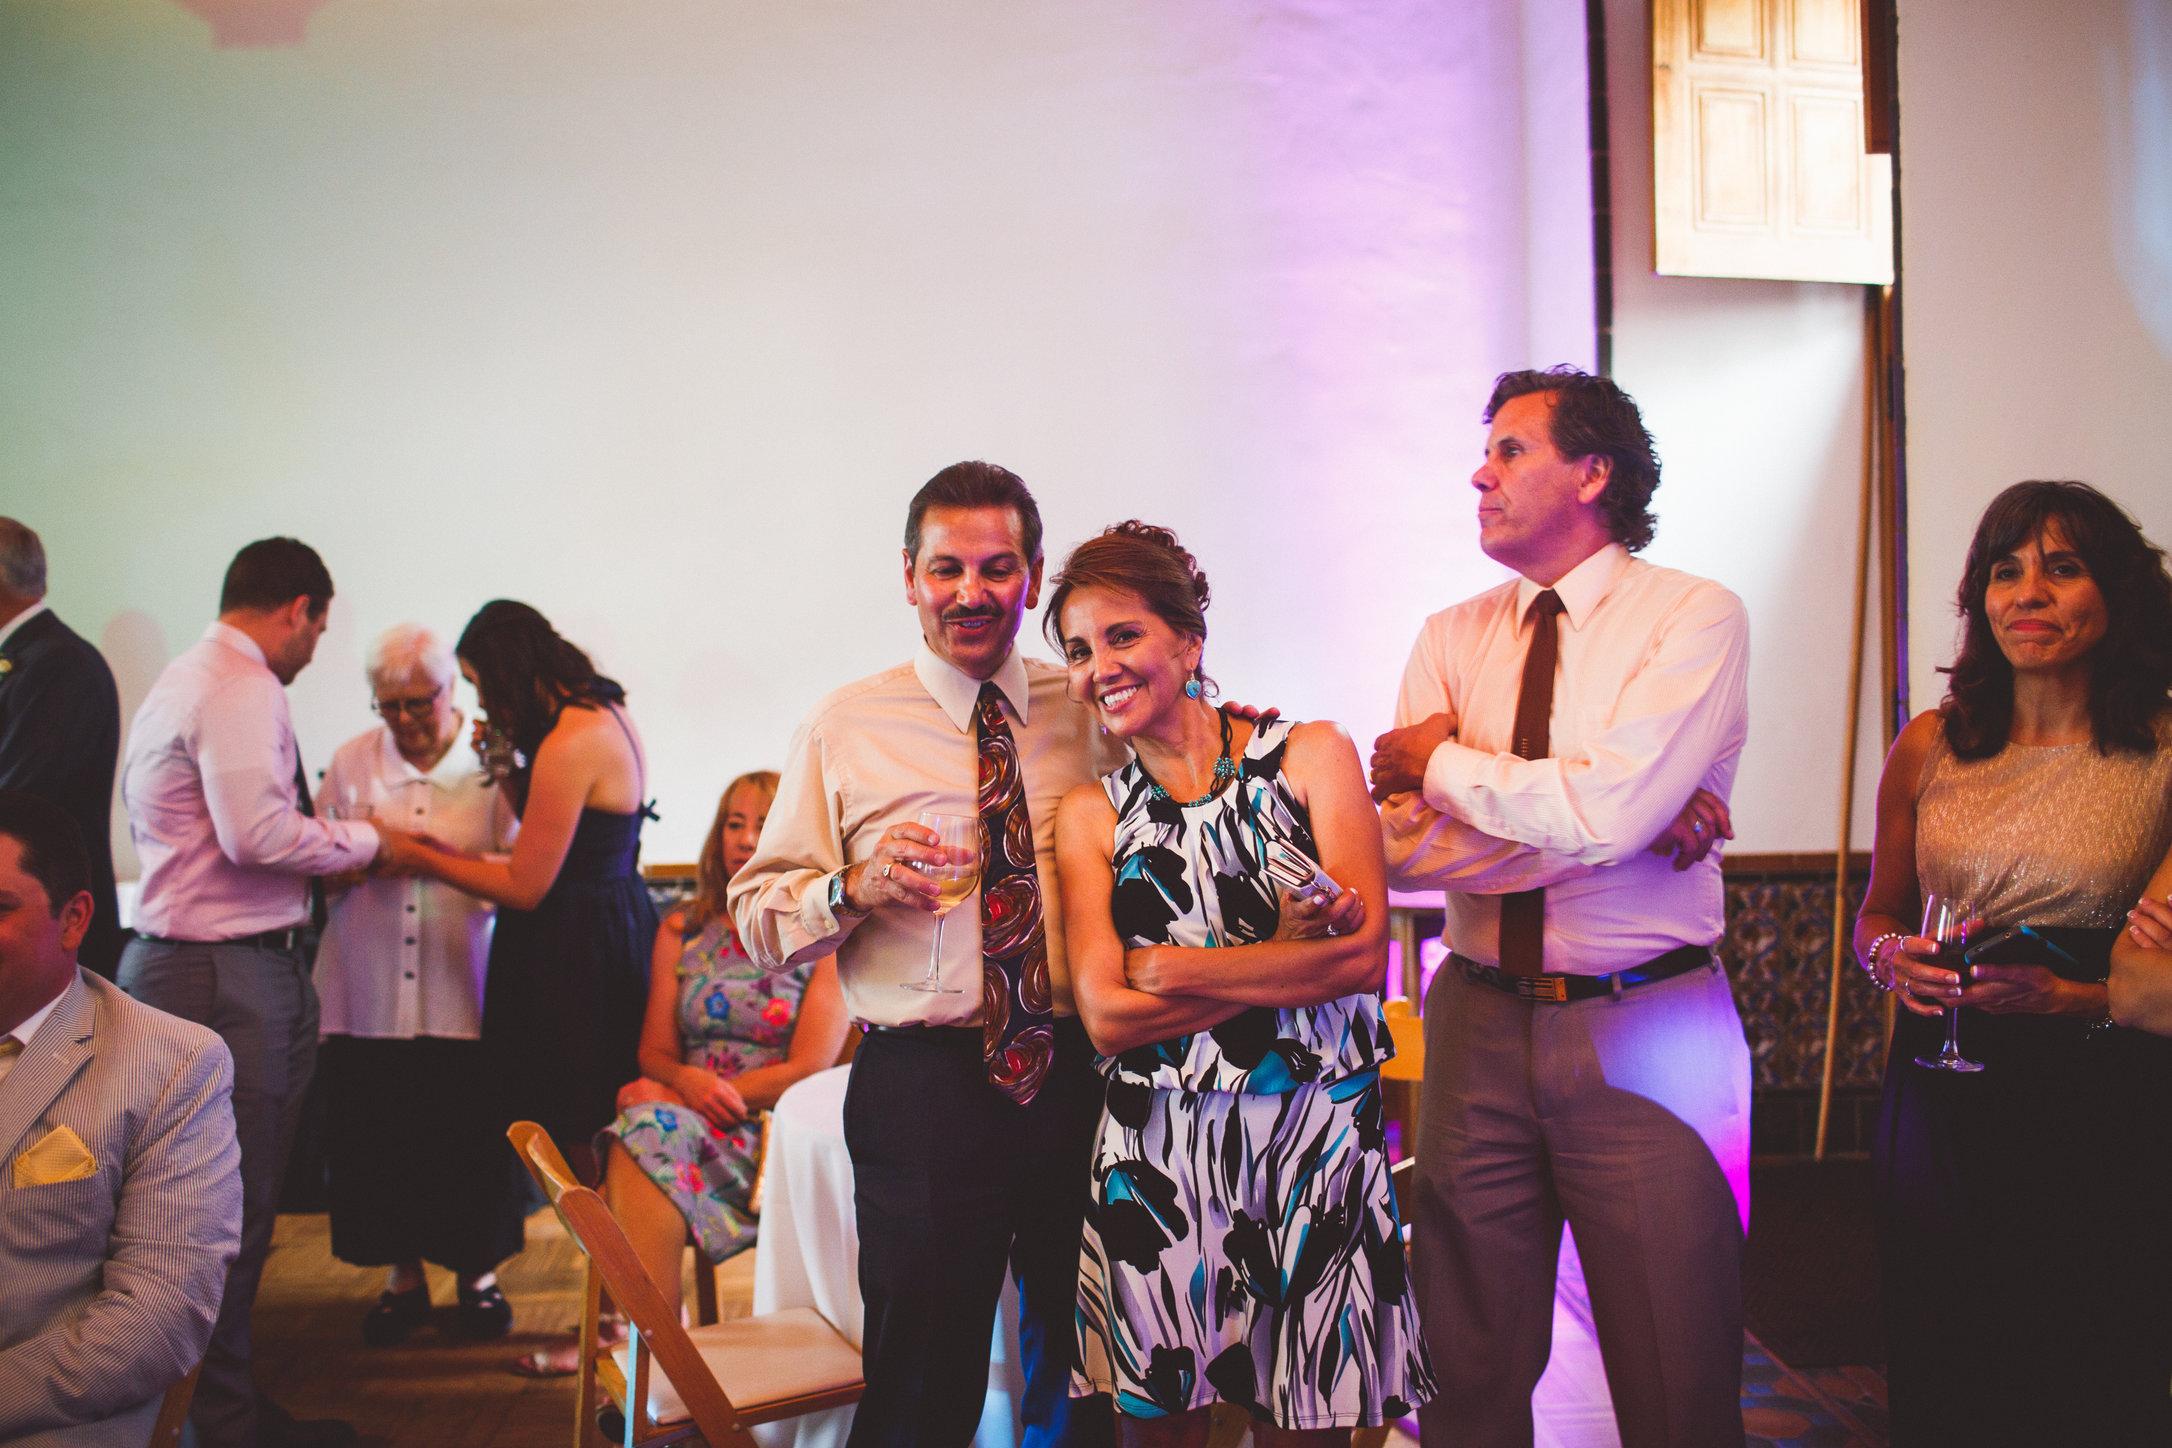 SandC-wedding-663.jpg